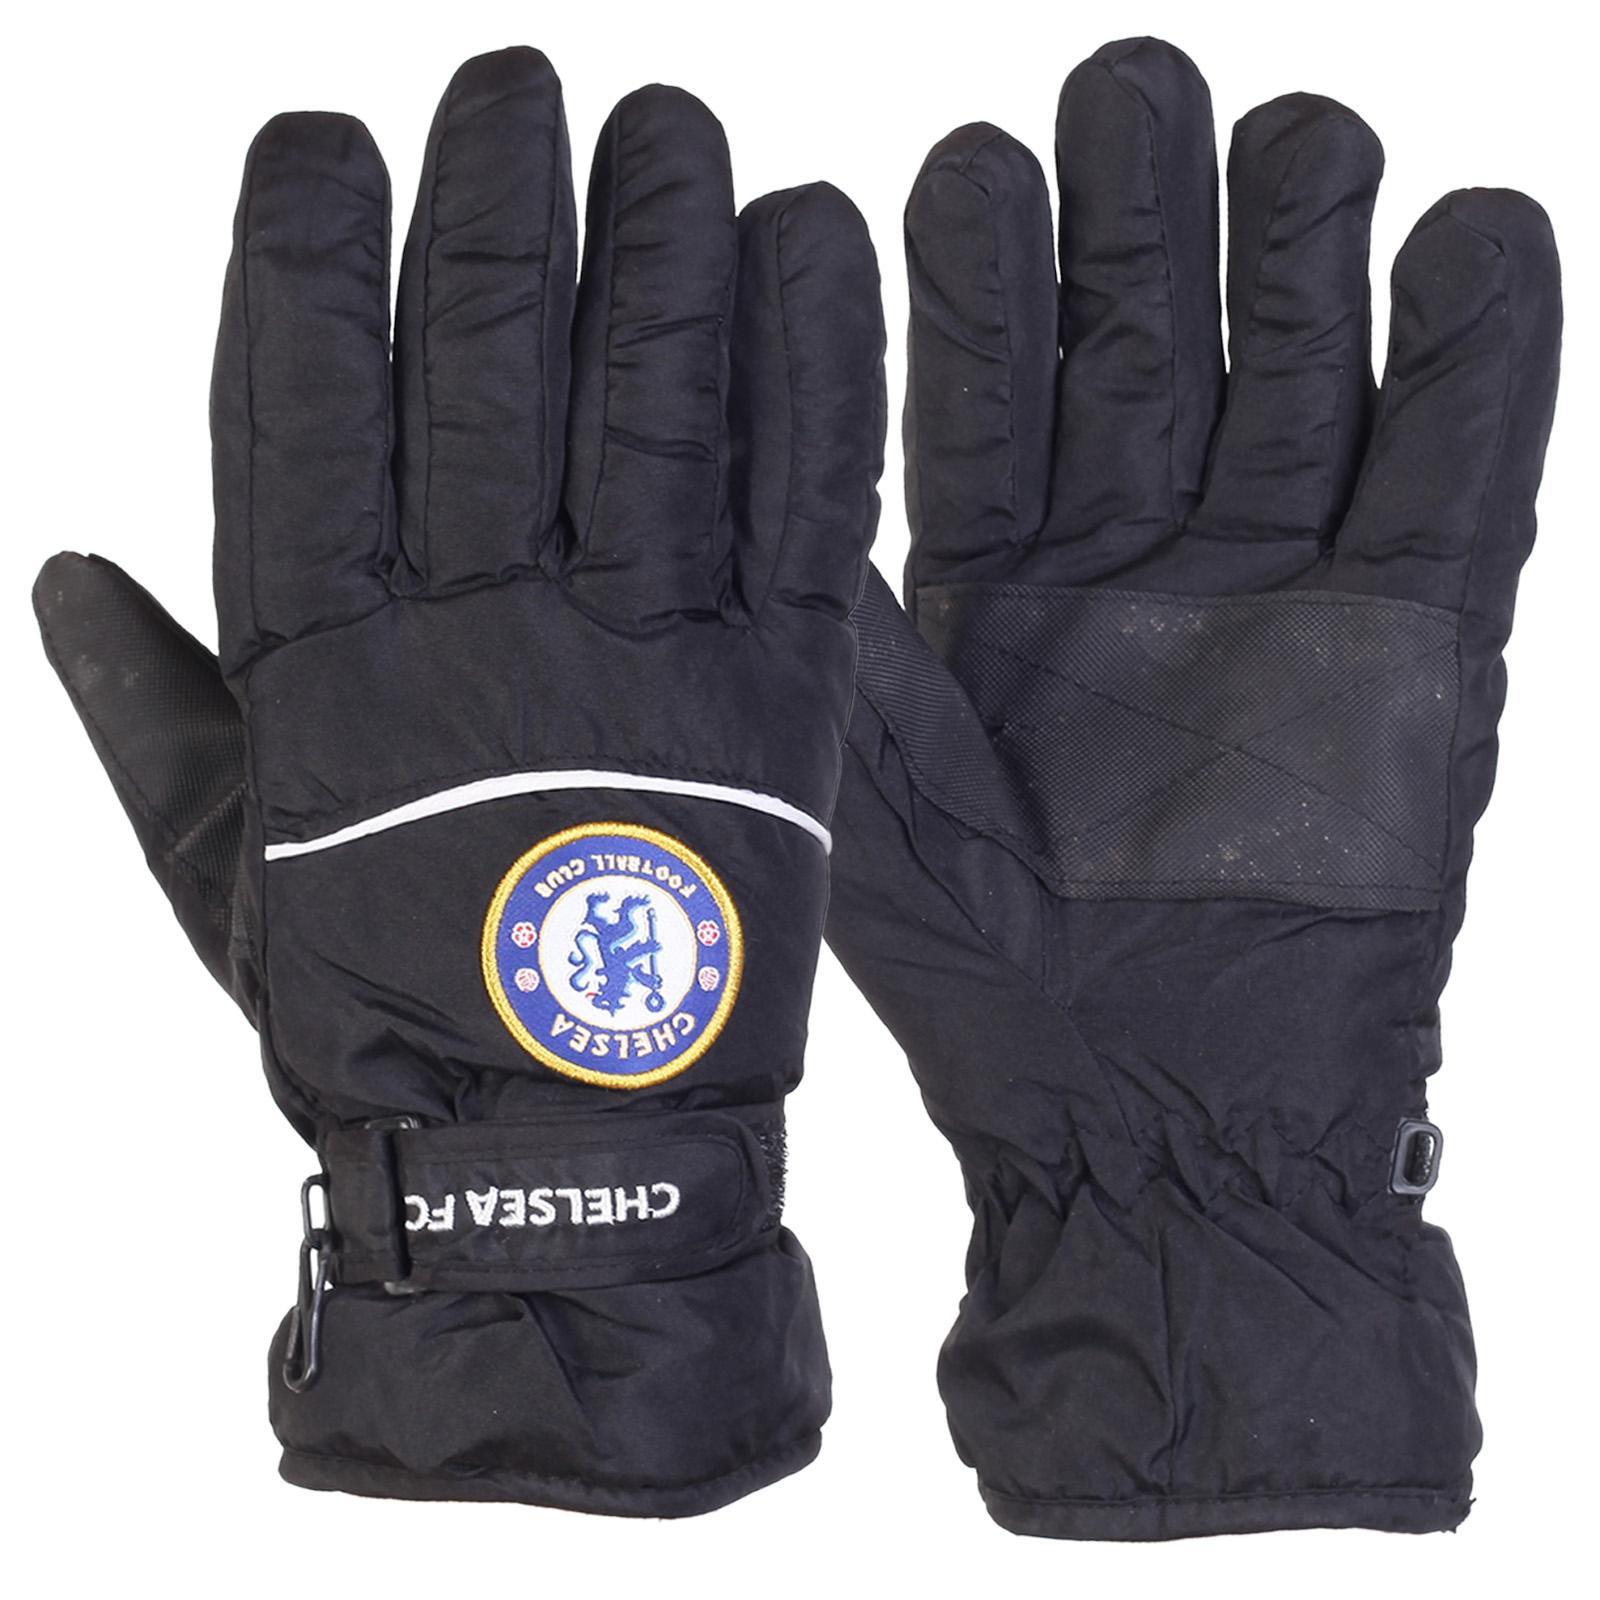 Мужские перчатки зима Chelsea FC